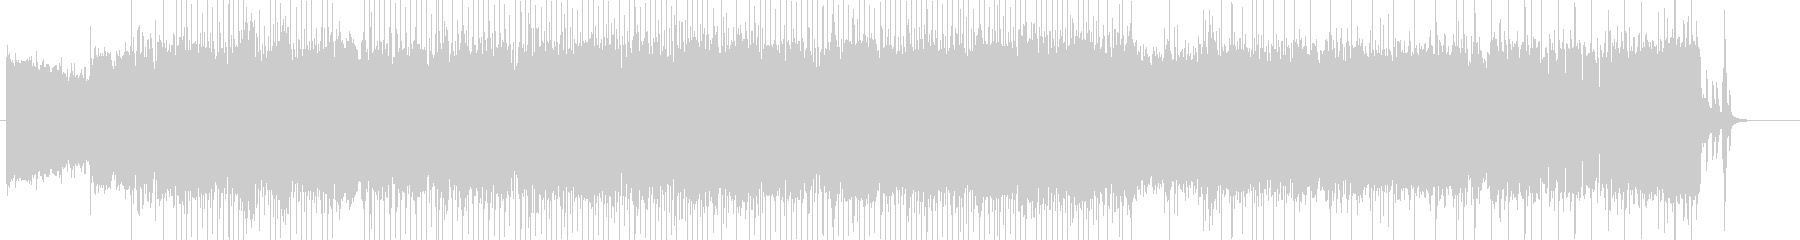 「HR/HM」「DARK系」BGM16の未再生の波形